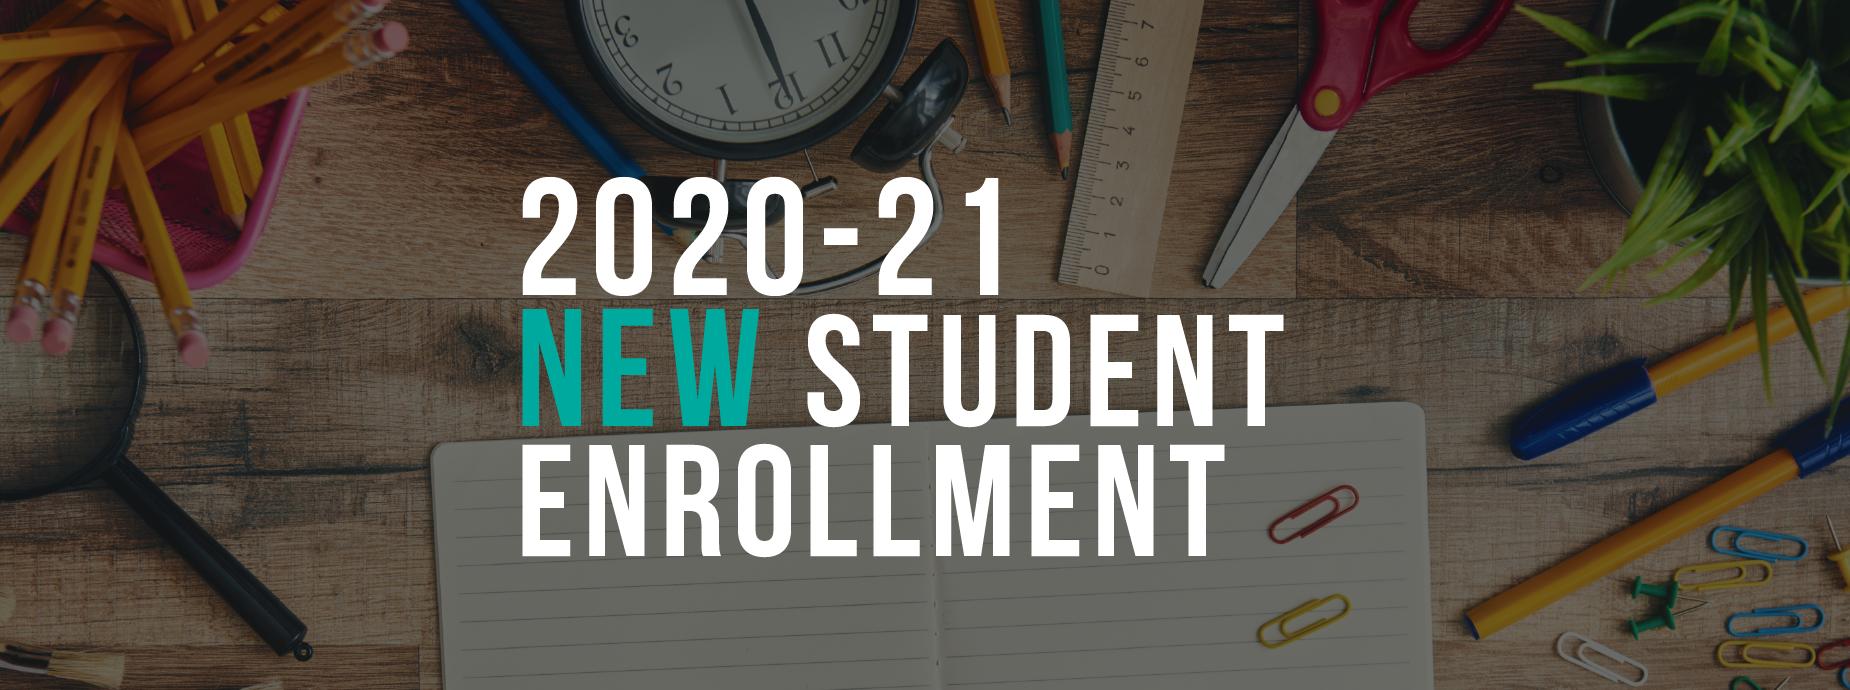 2020-21New Student Enrollment